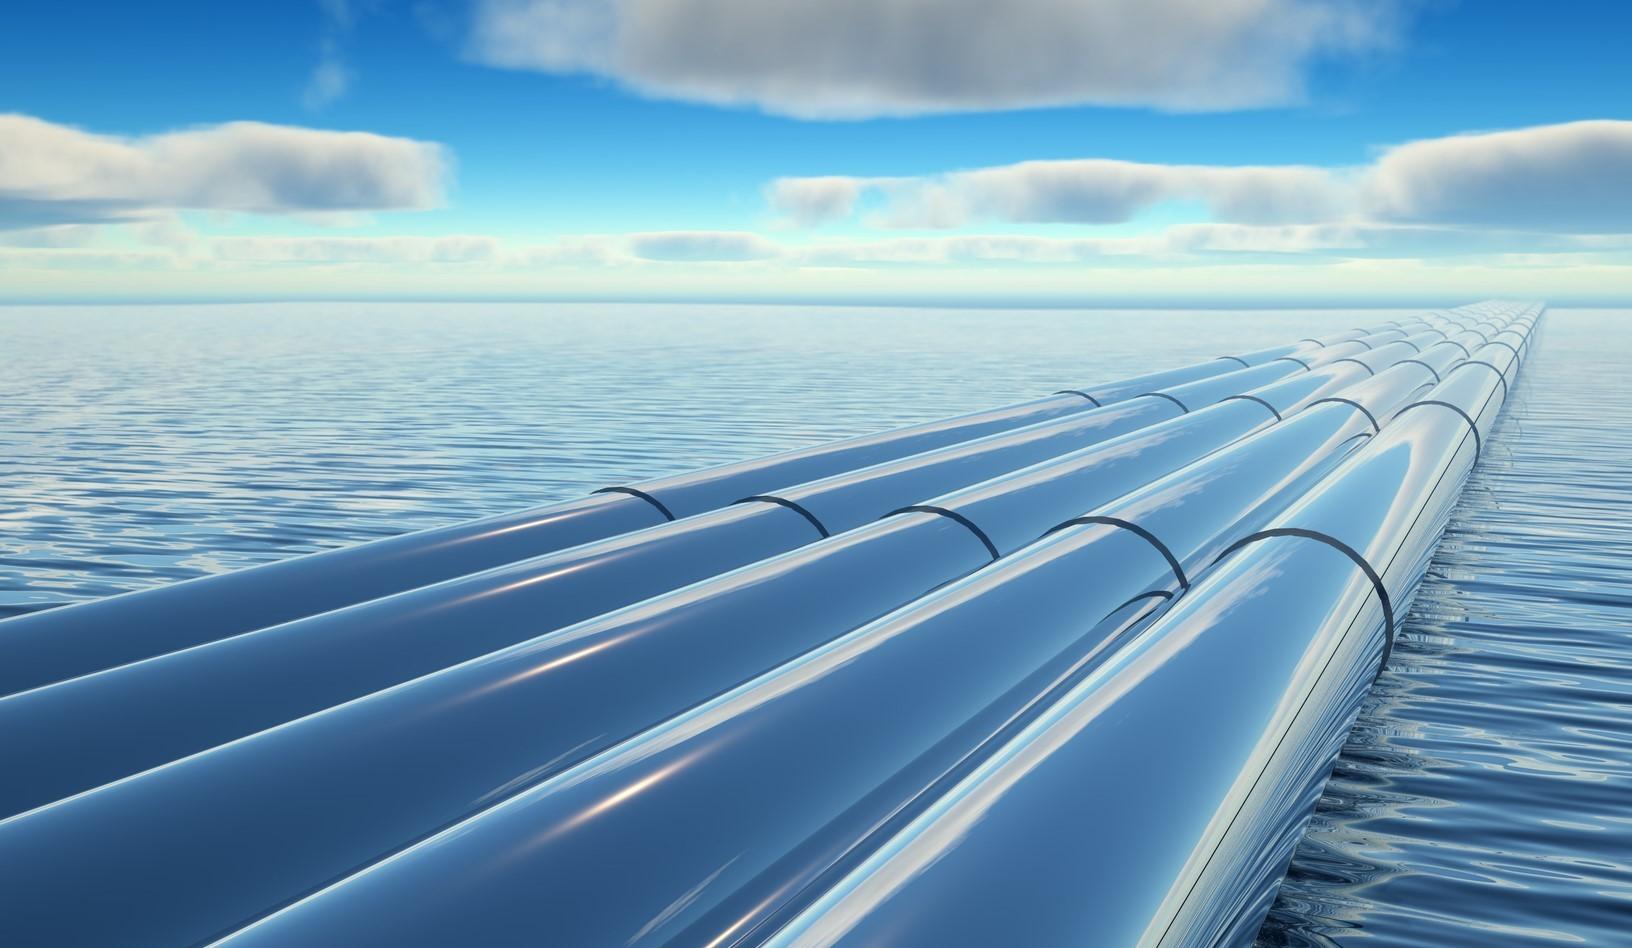 ursalink_remote_pipeline_monitoring_image2